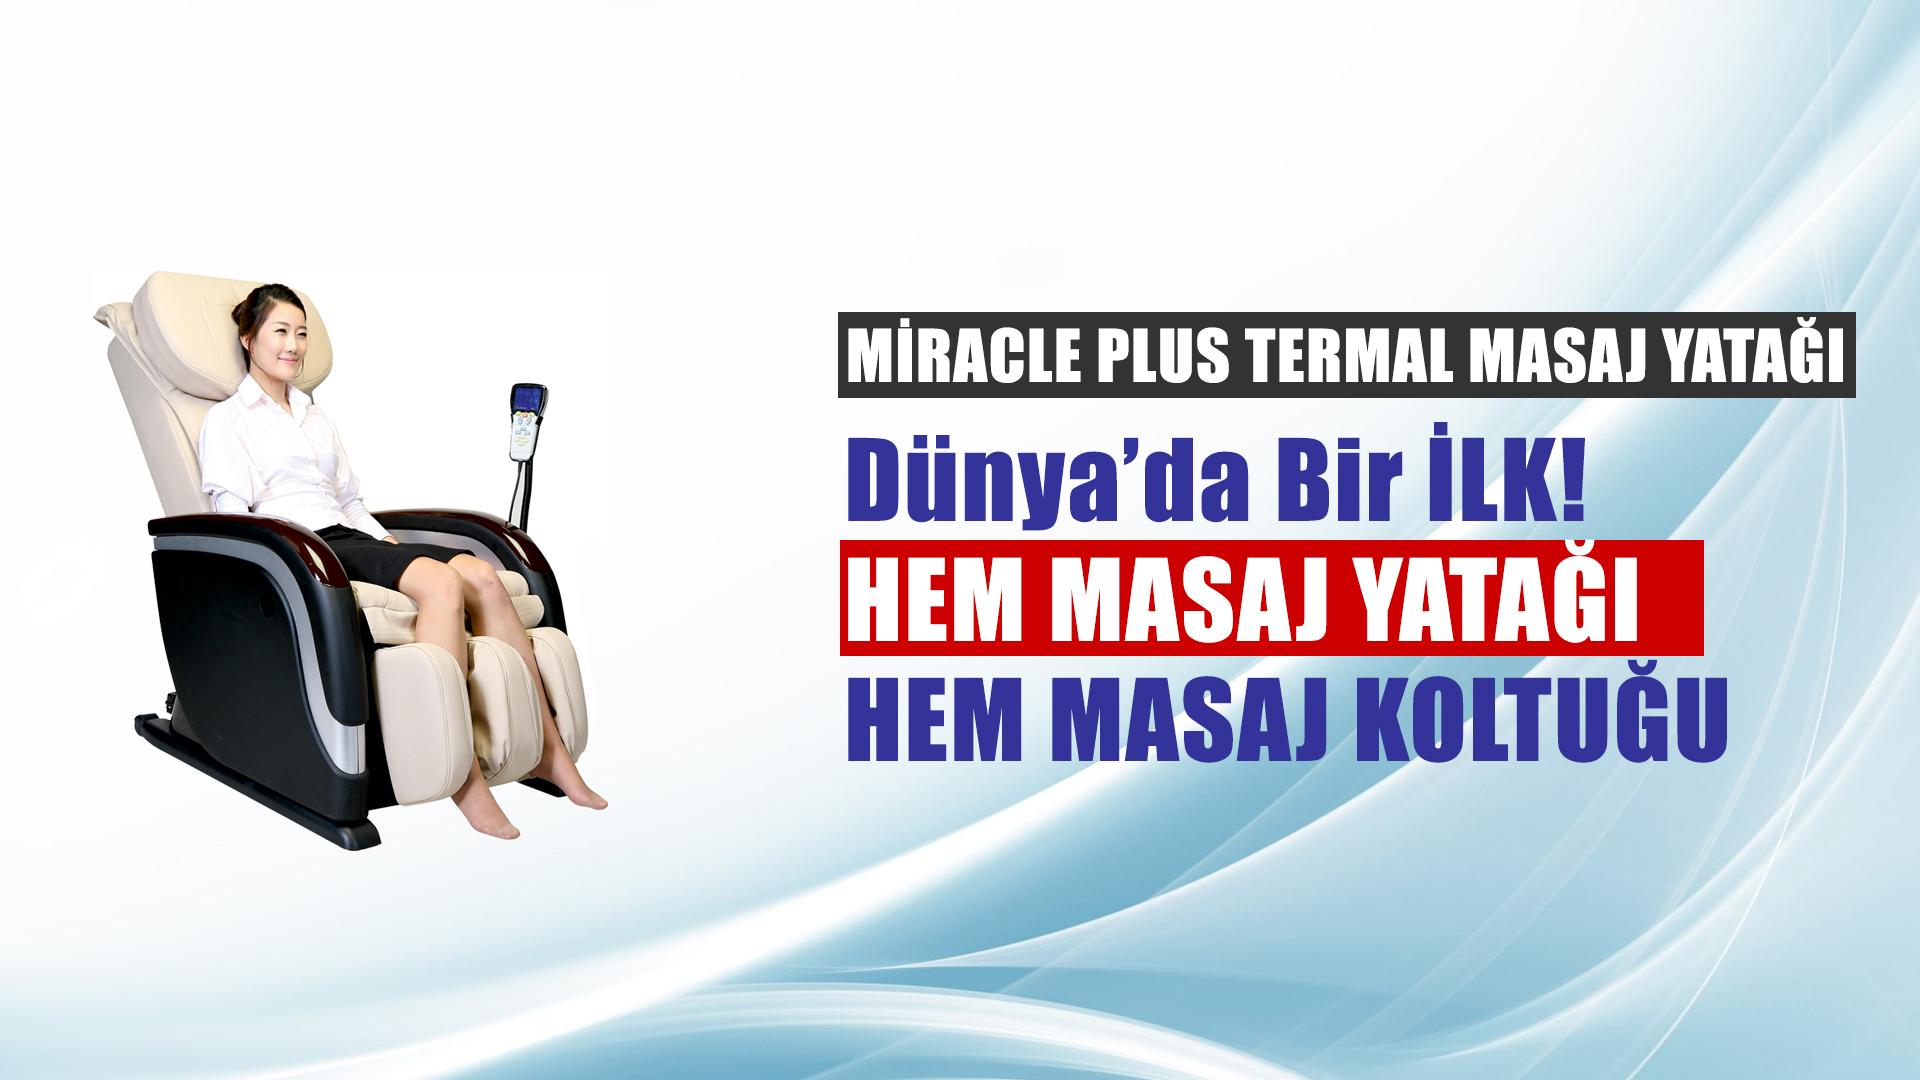 Miracle Plus Termal Masaj Yatağı